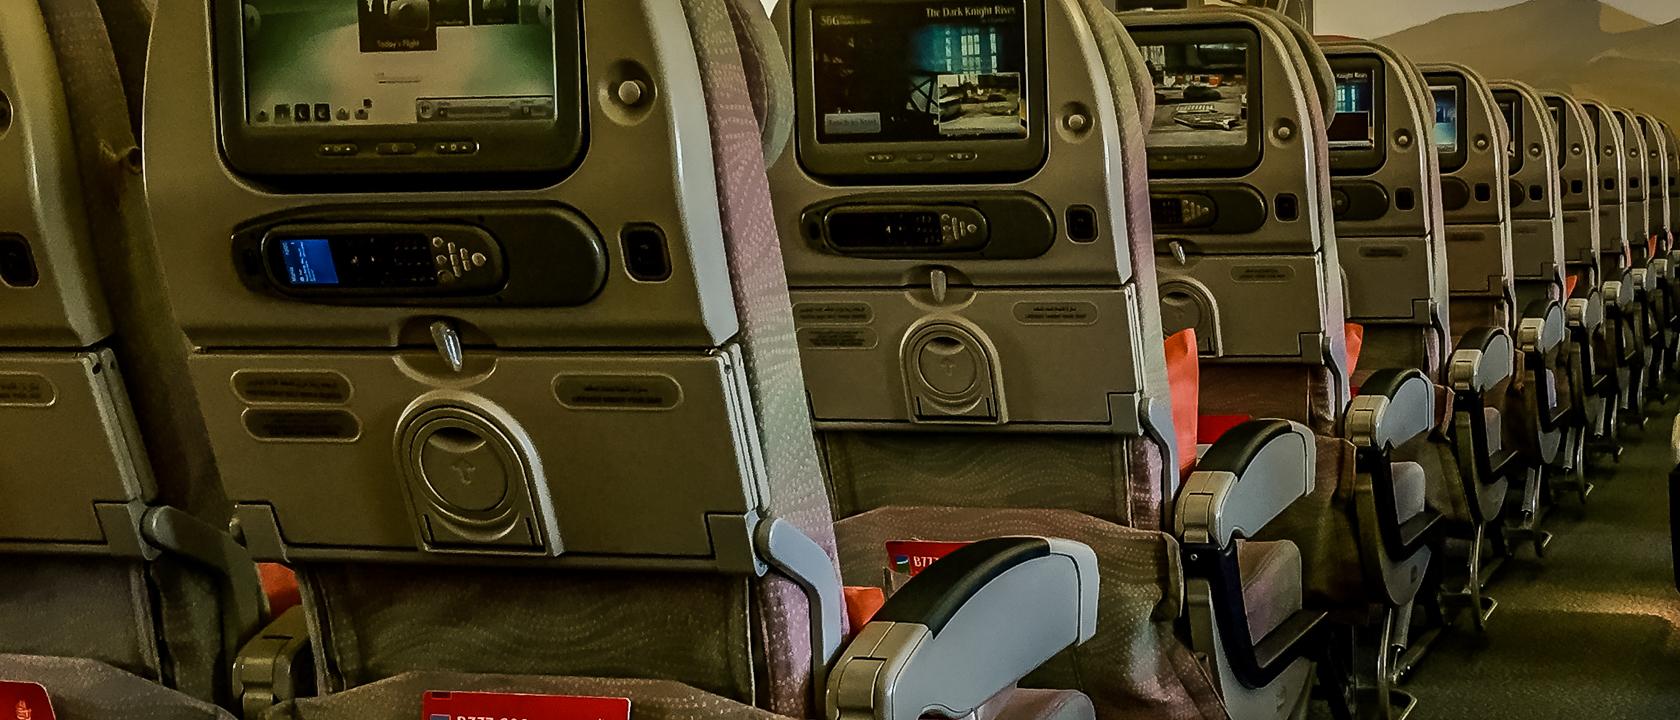 AIR TRAVEL TIPS